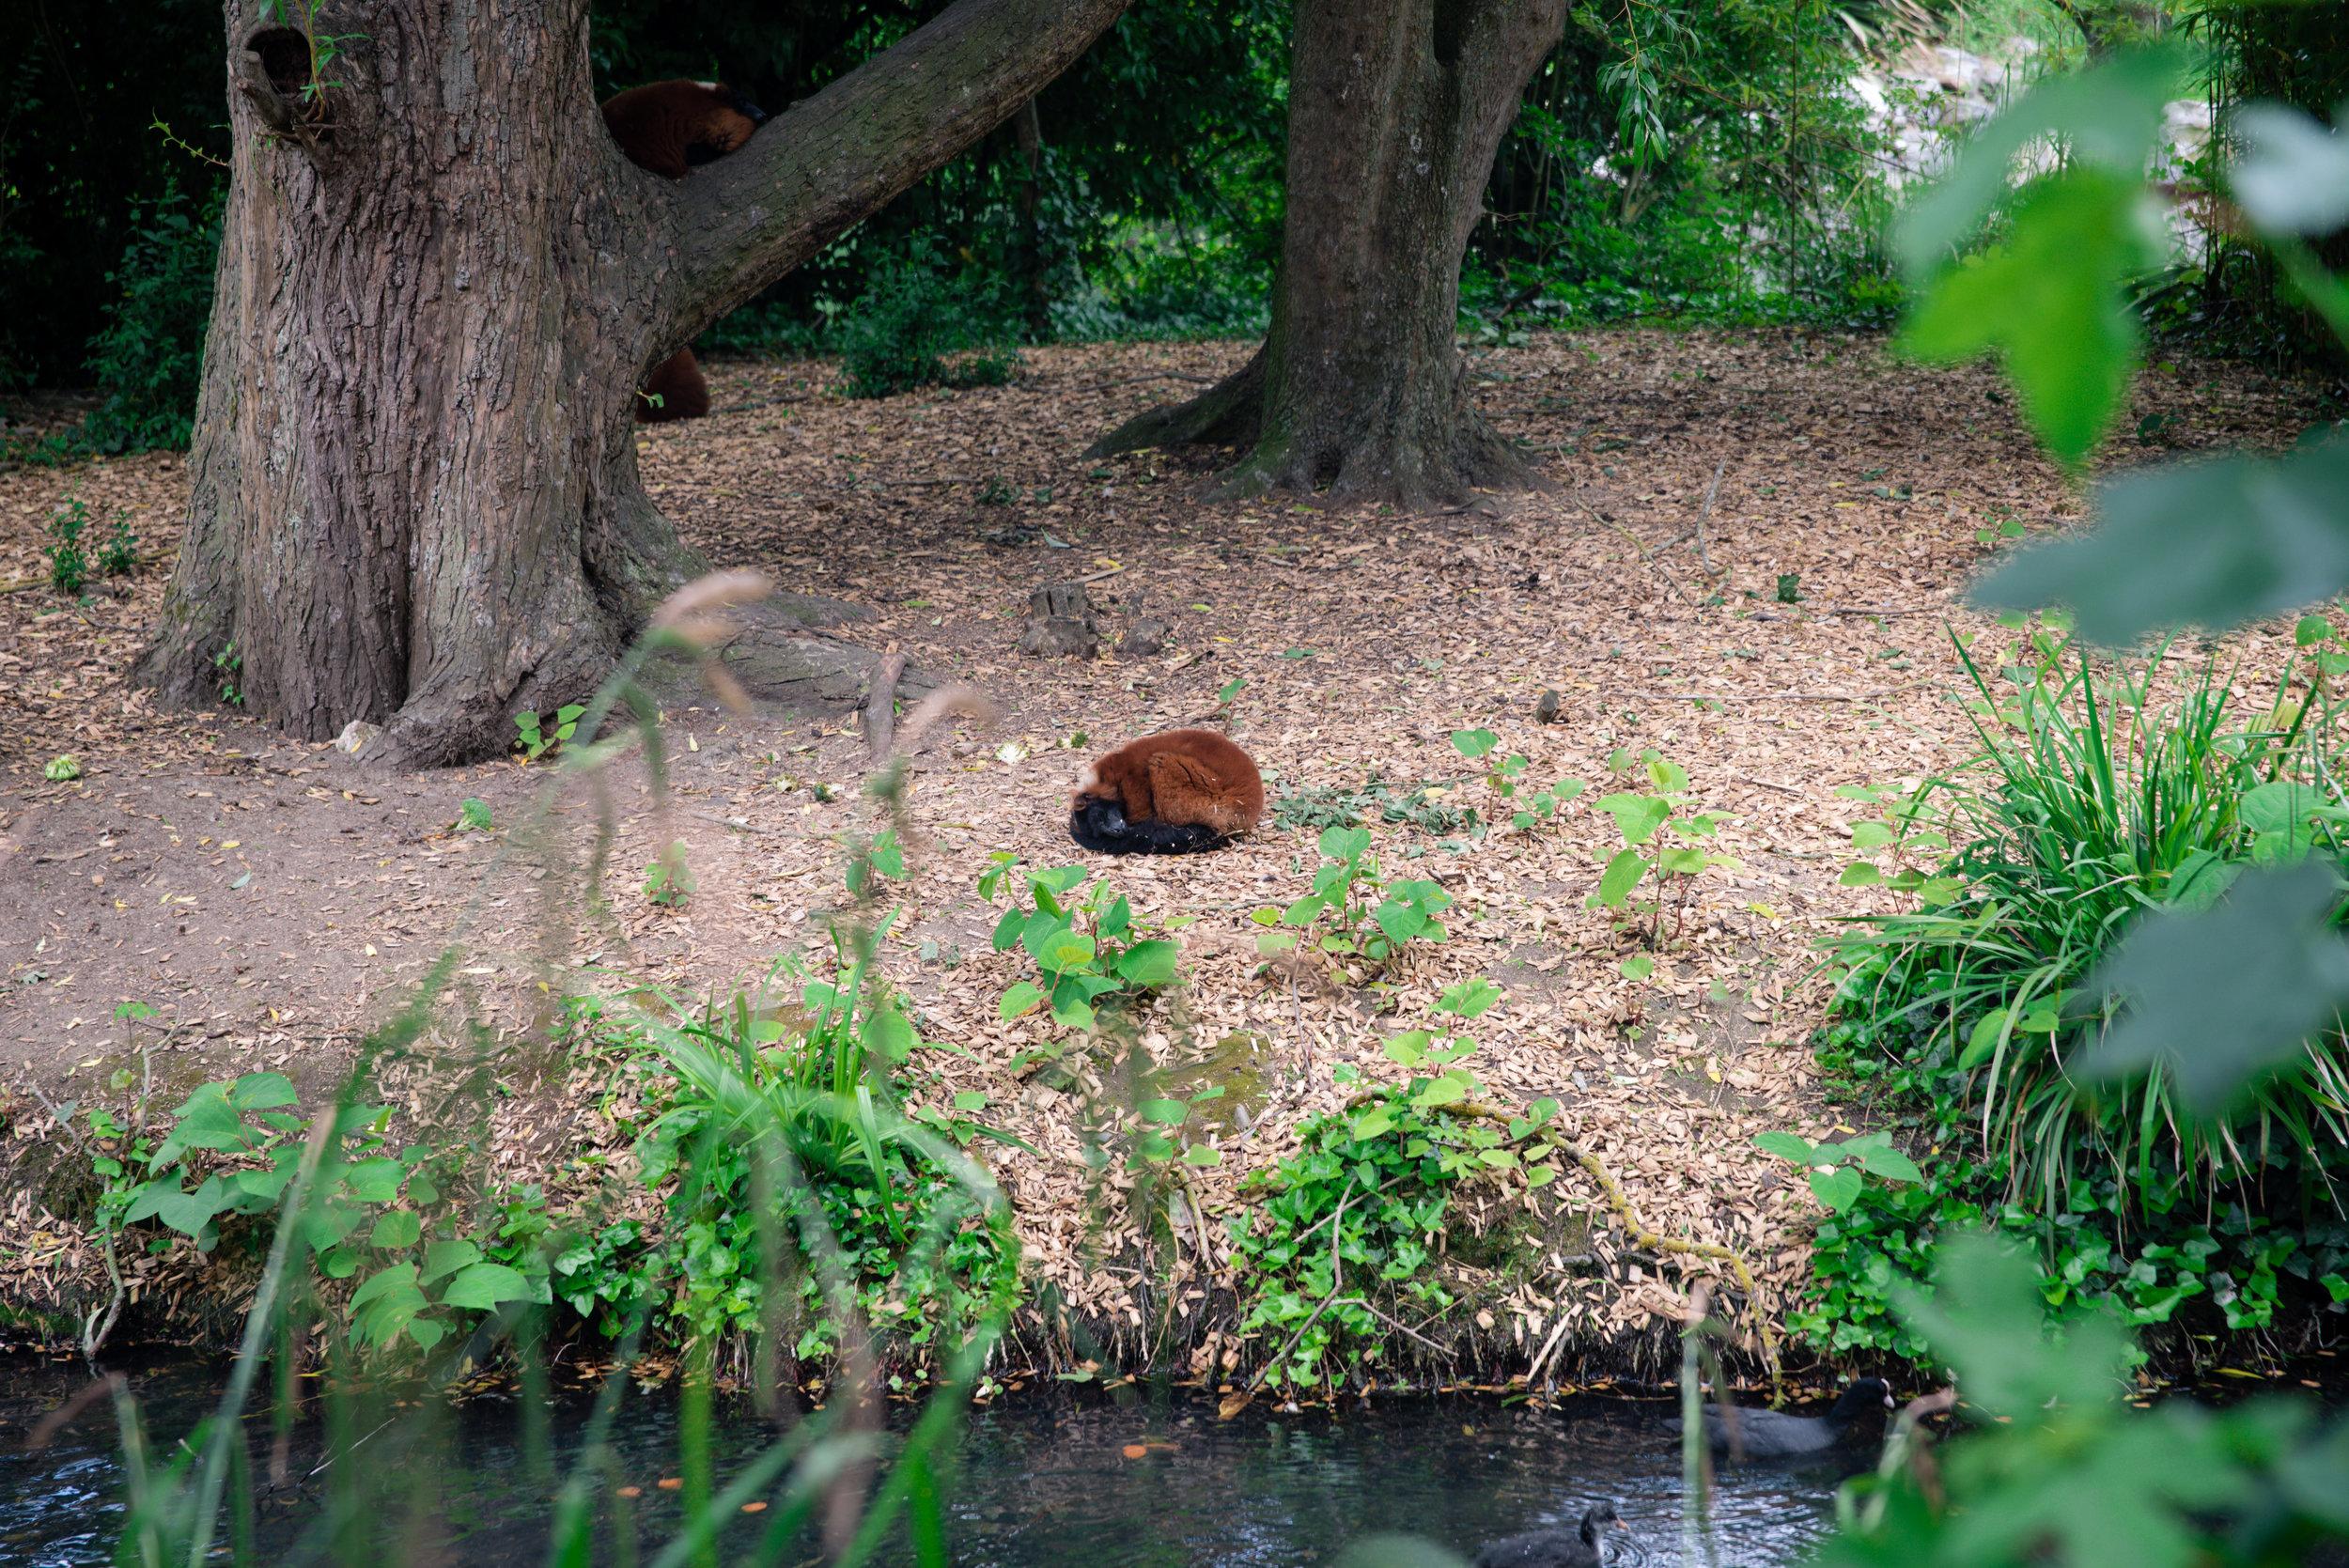 Red-Ruffed Lemur snoozing